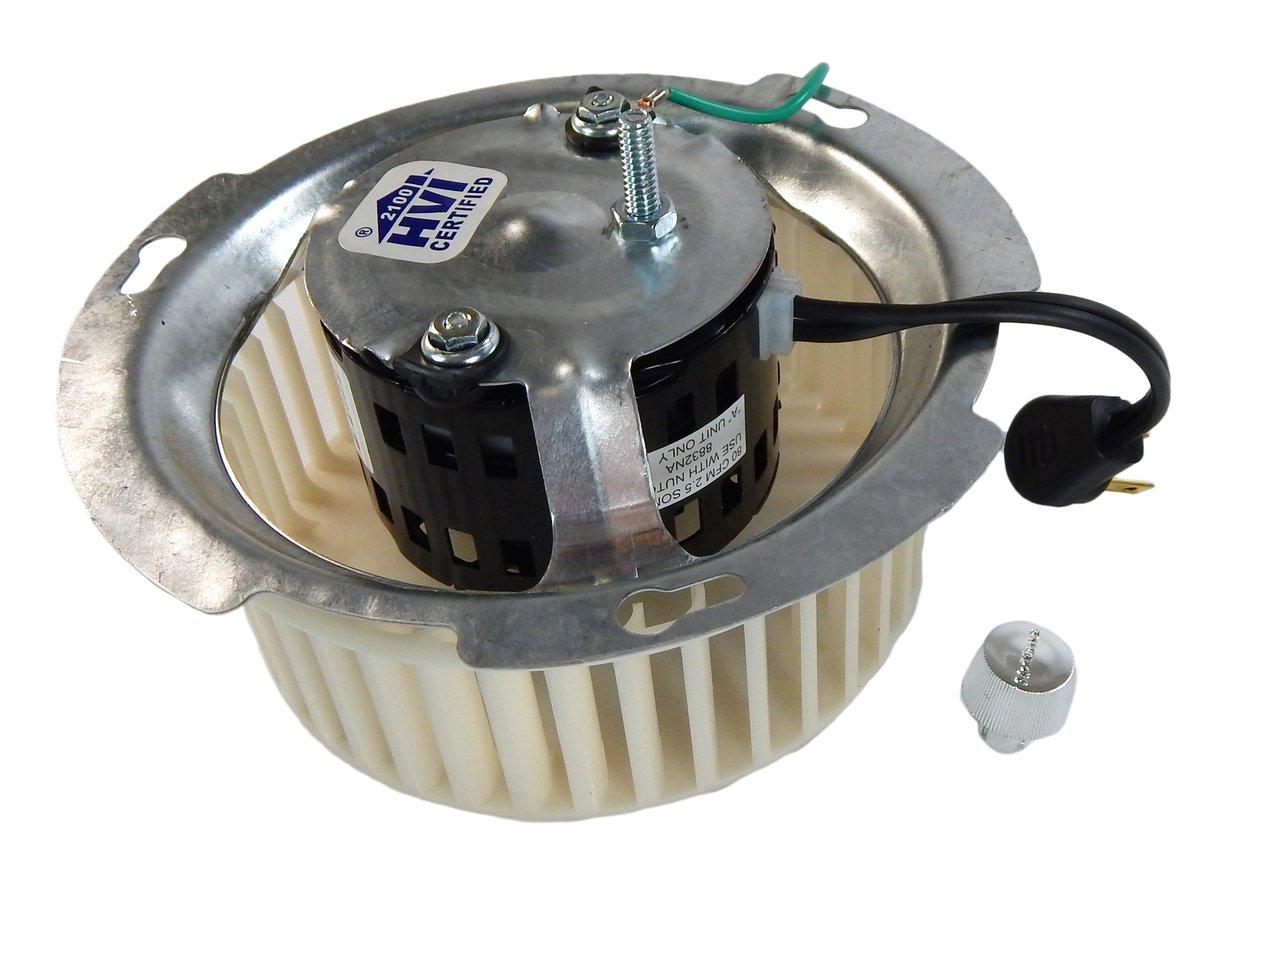 Nutone 8832NA Blower Motor Assembly (JA2B099N) 1285 RPM 120 Volts # 84757